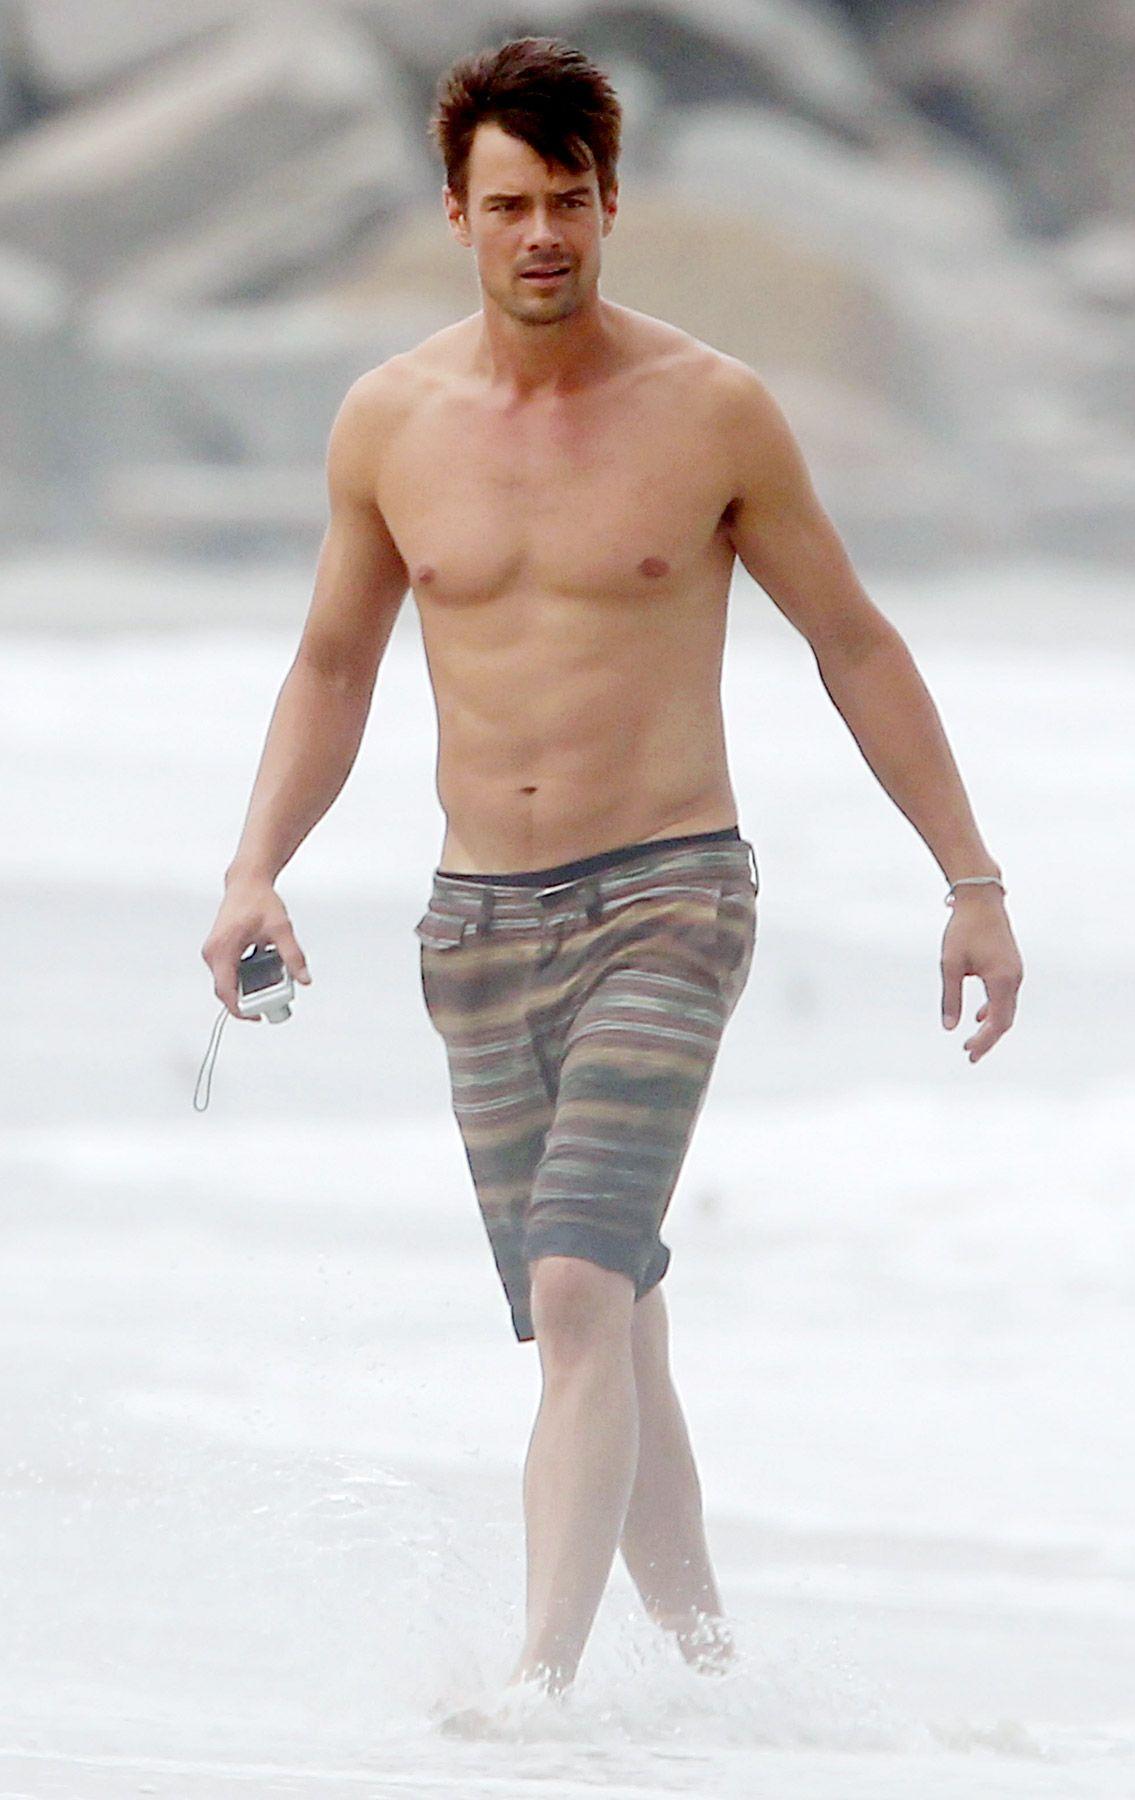 hot women naked in water